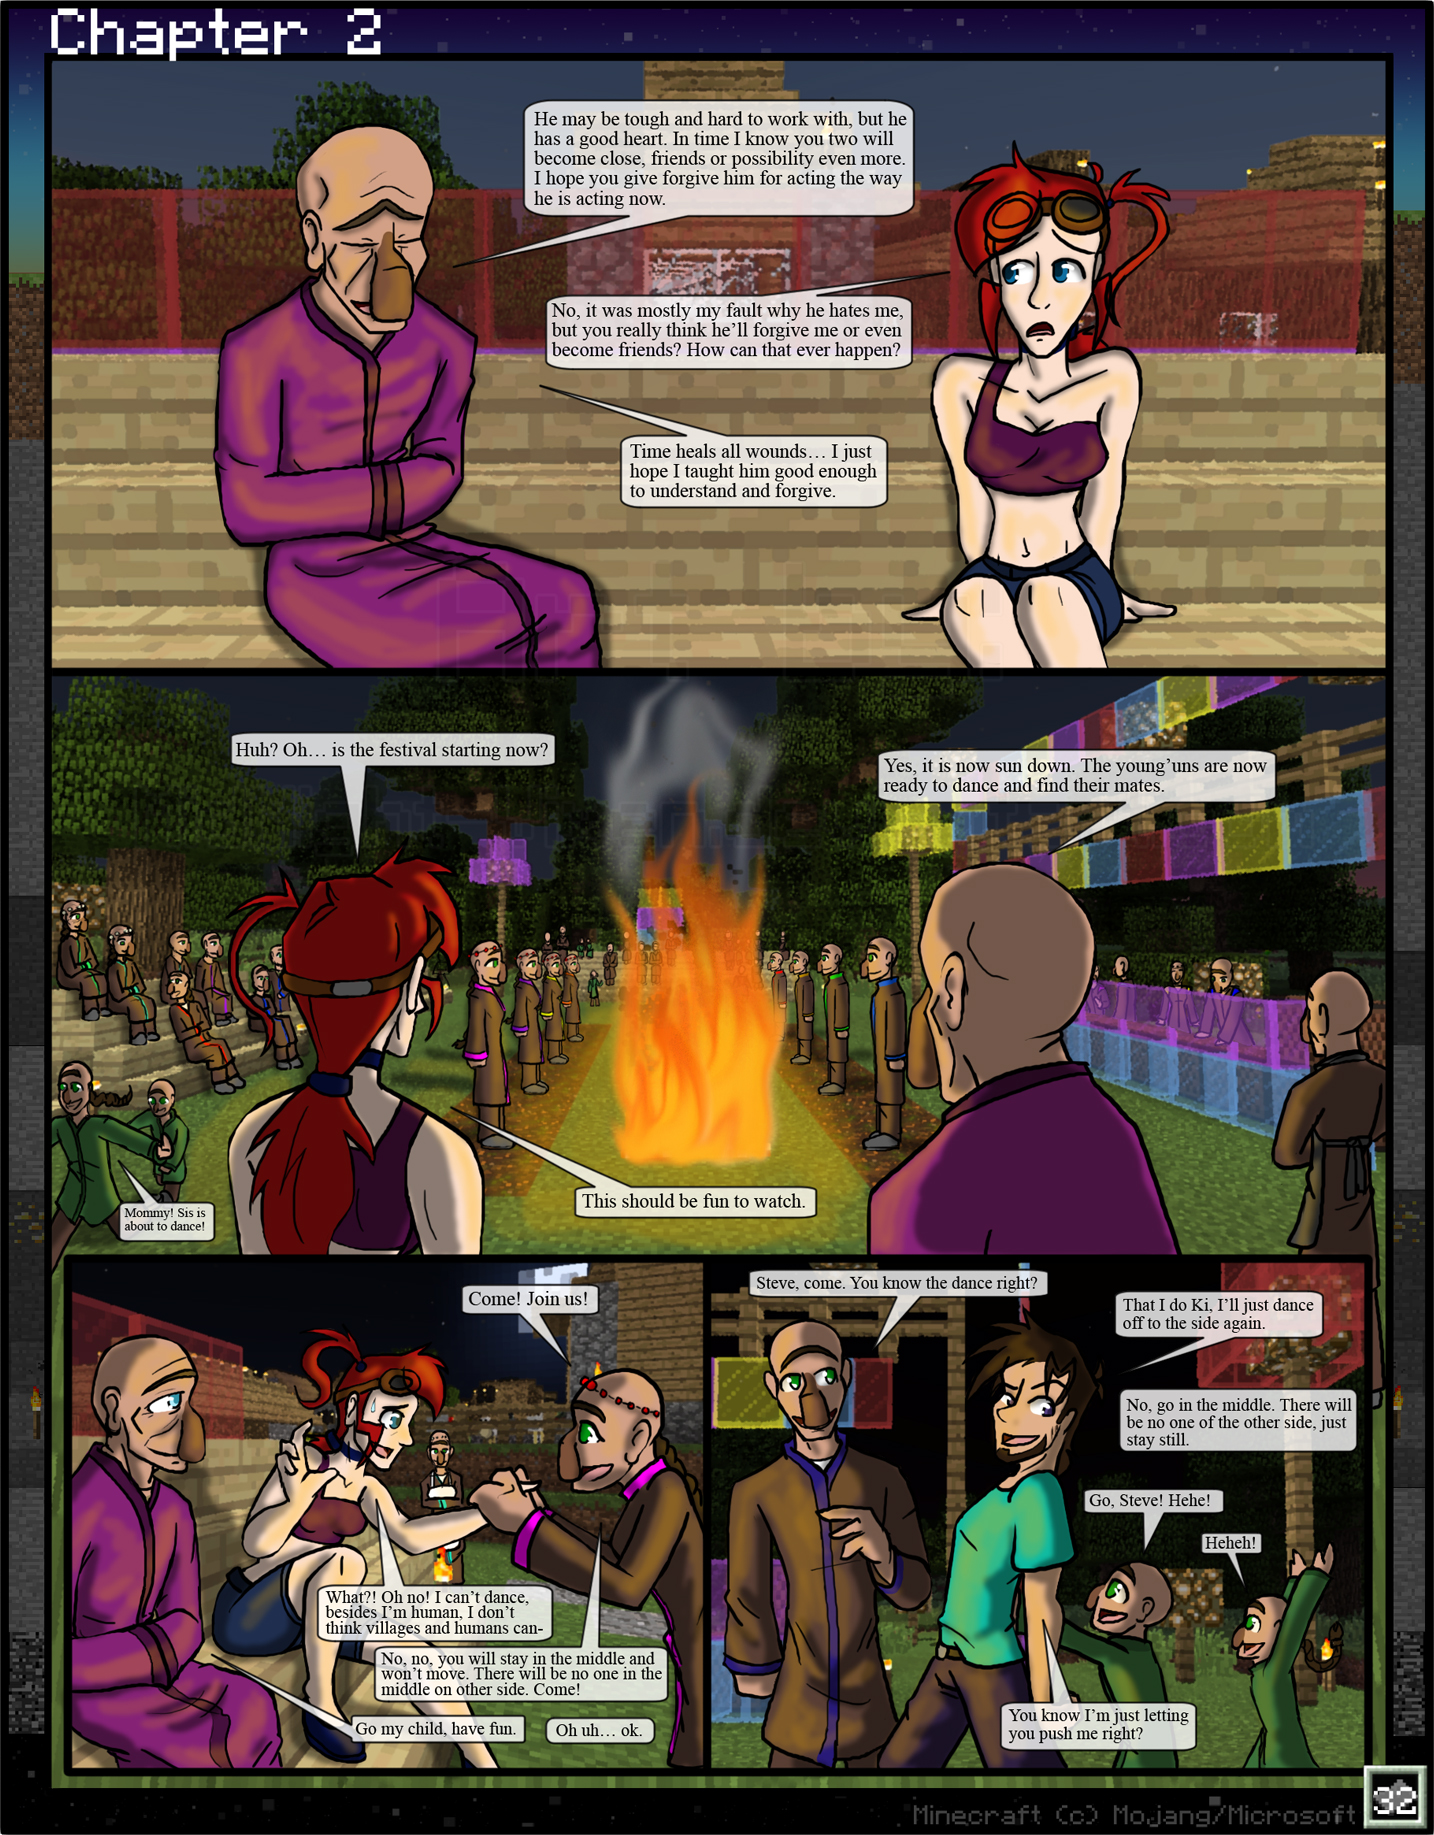 Minecraft: The Awakening Ch2. 32 by TomBoy-Comics